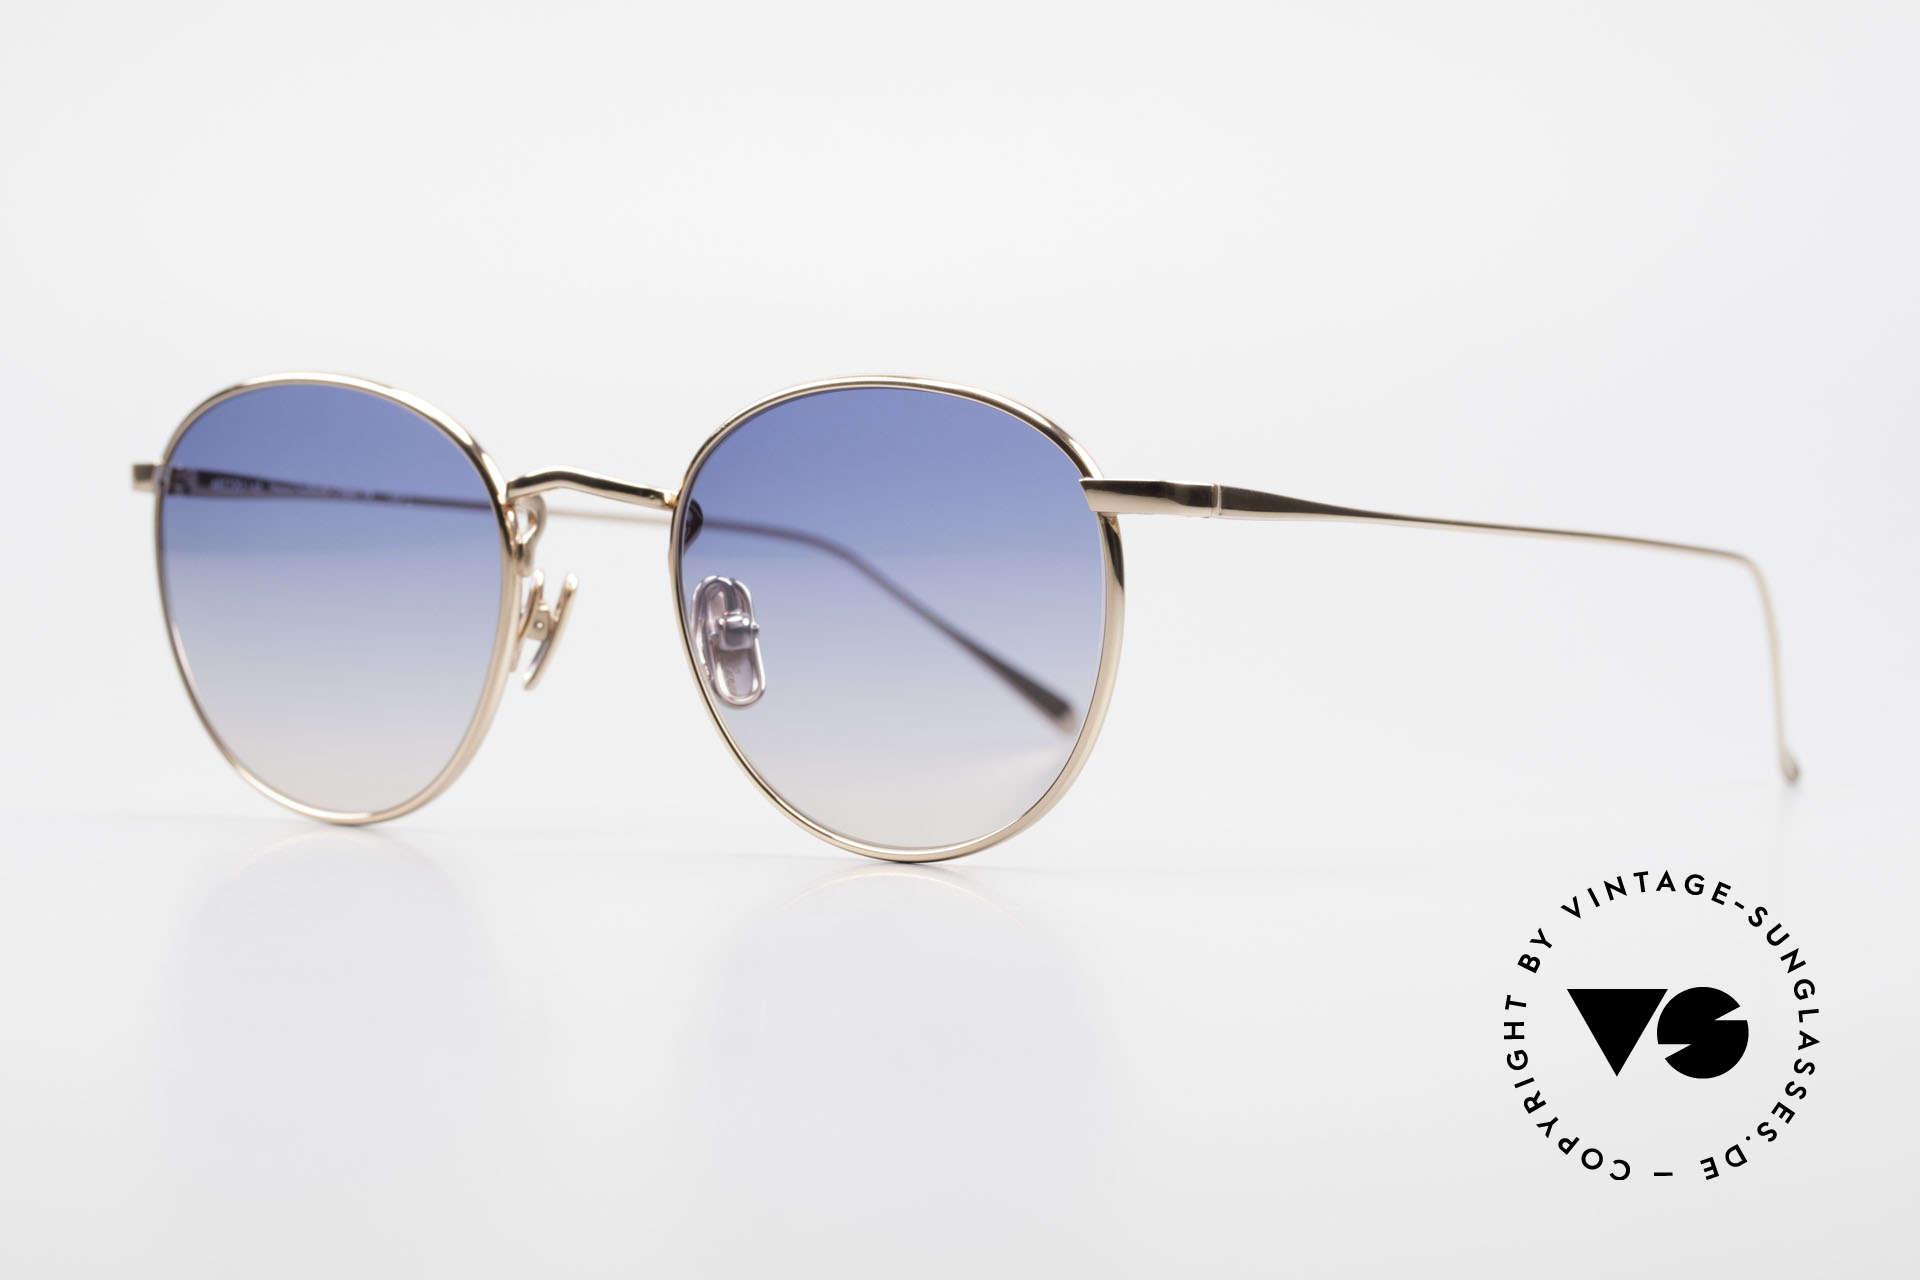 Lunor M9 Mod 01 RG Titan Sunglasses Rose Gold, M9 model 01, ROSÉ GOLD Titanium frame, size 48x20, Made for Men and Women